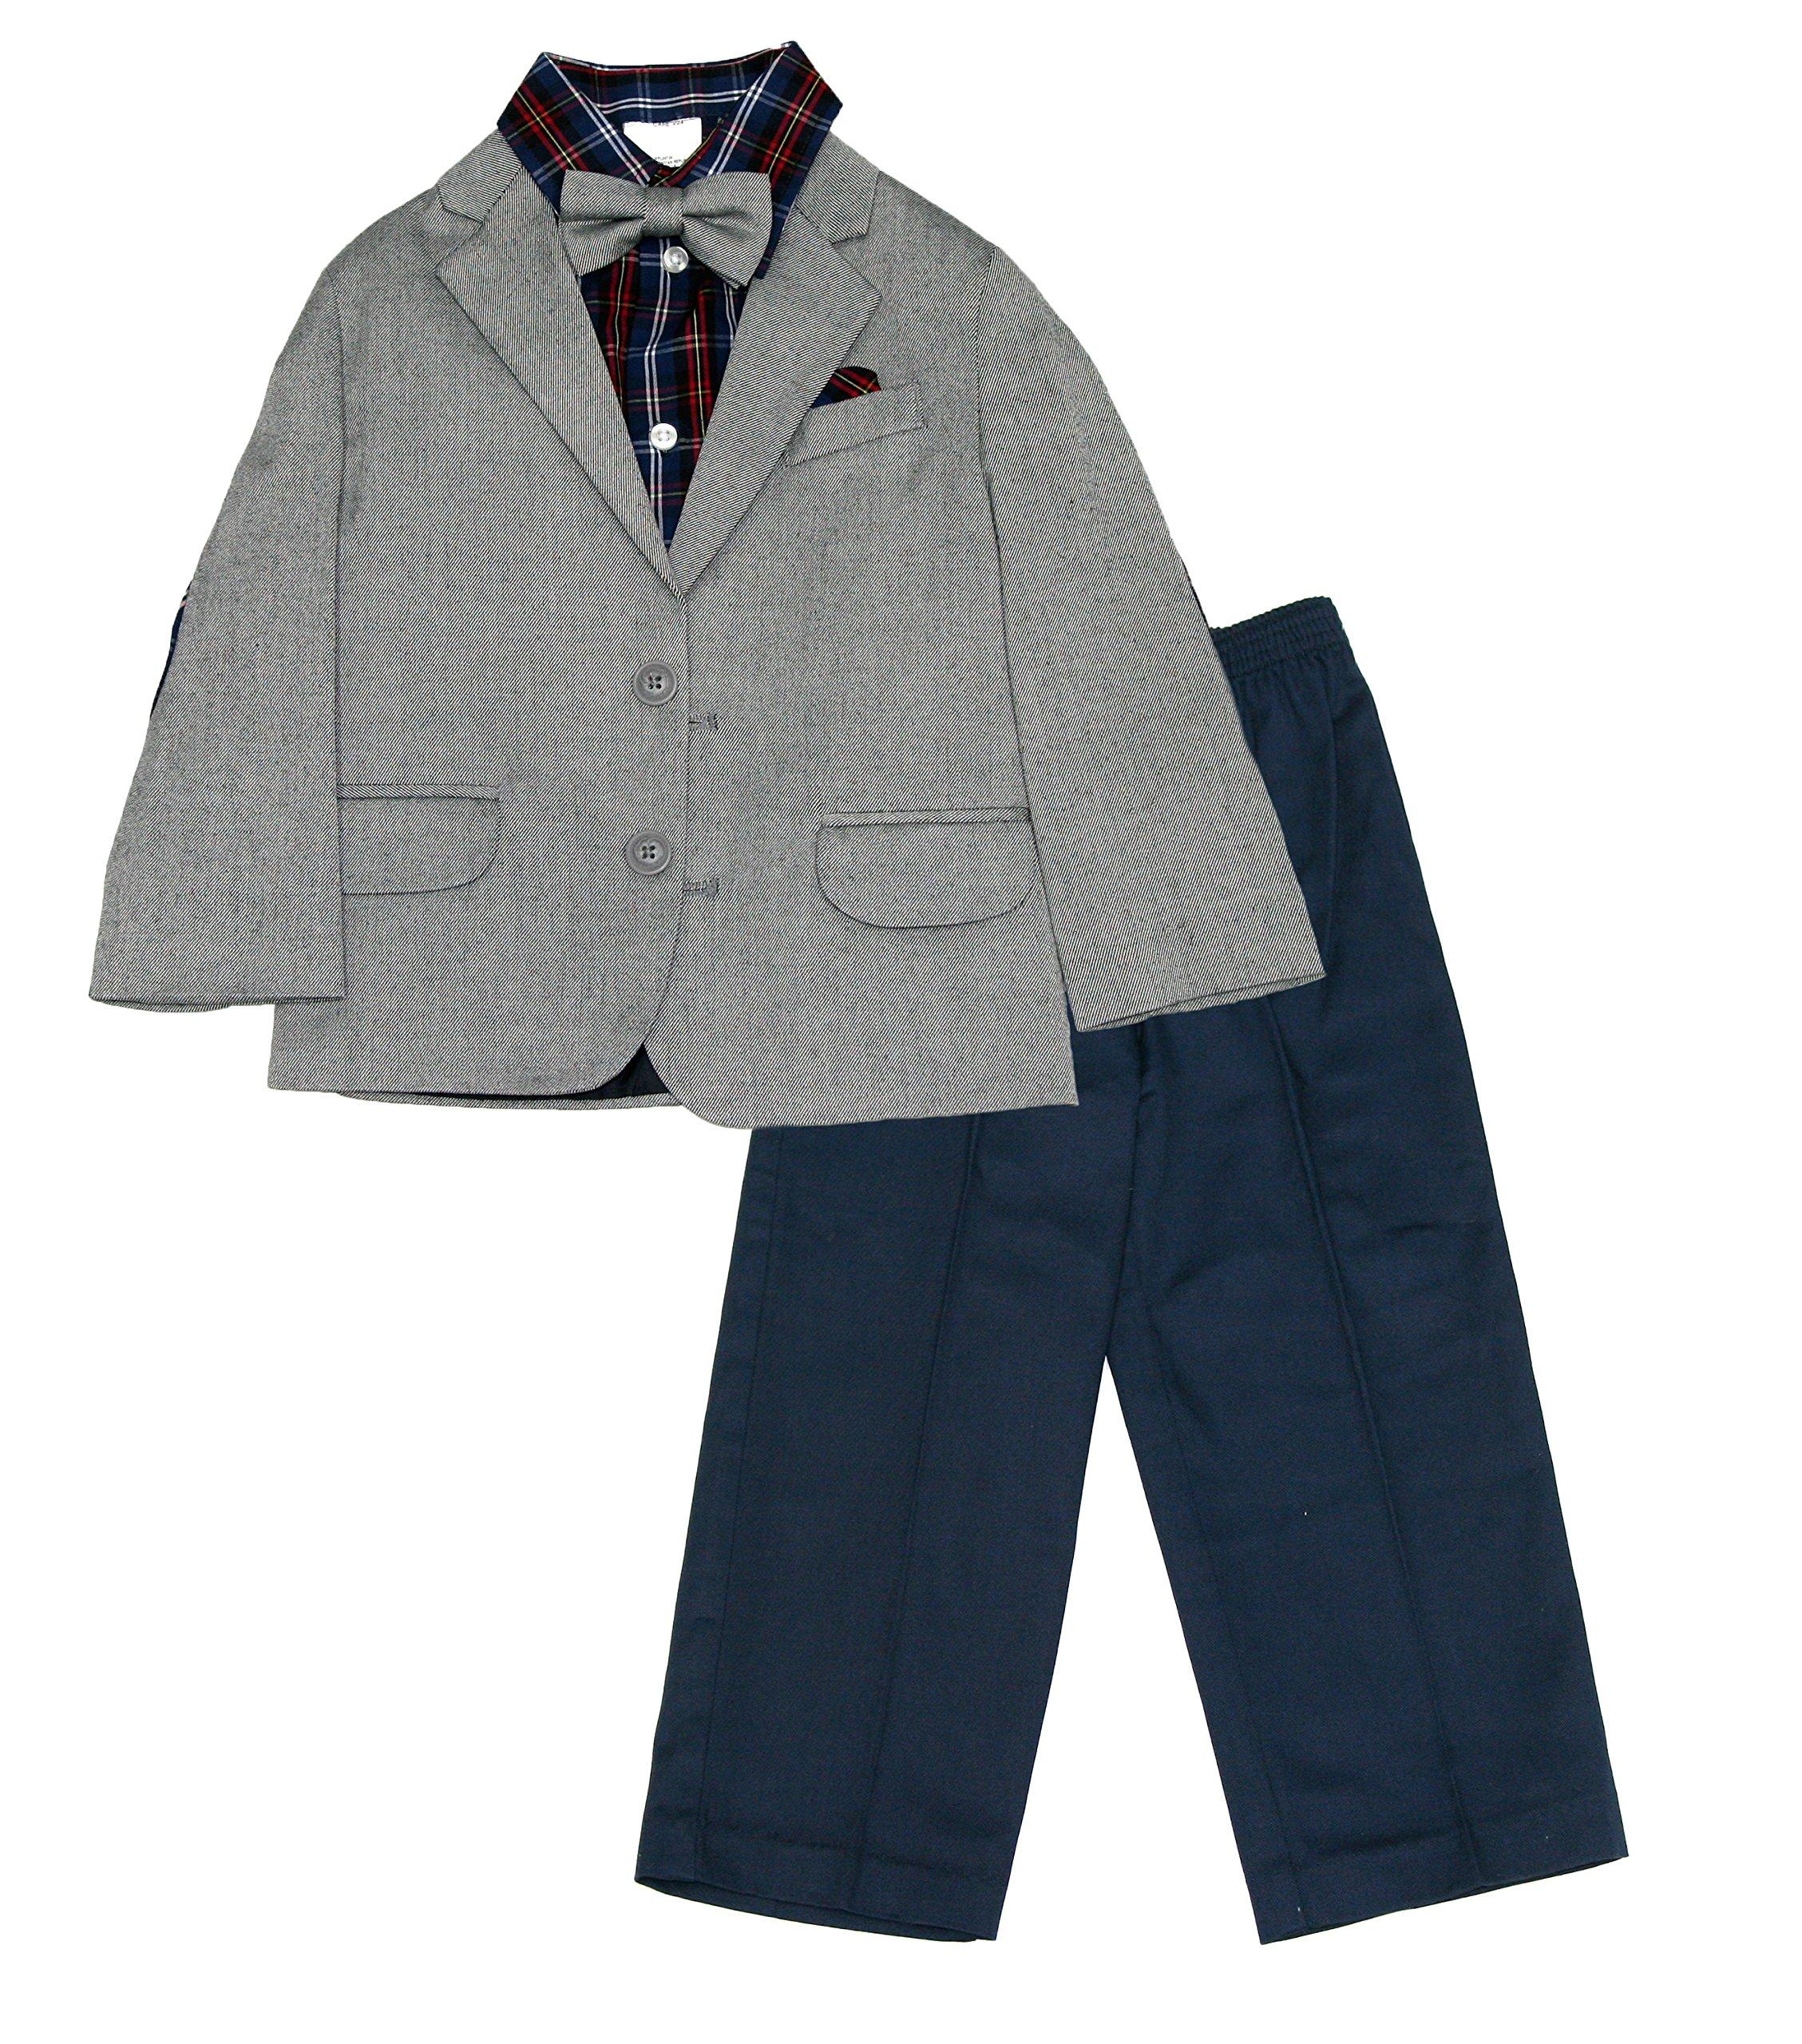 Nautica Toddler/Little Boys 4 Piece Suit (Grey, 3T)